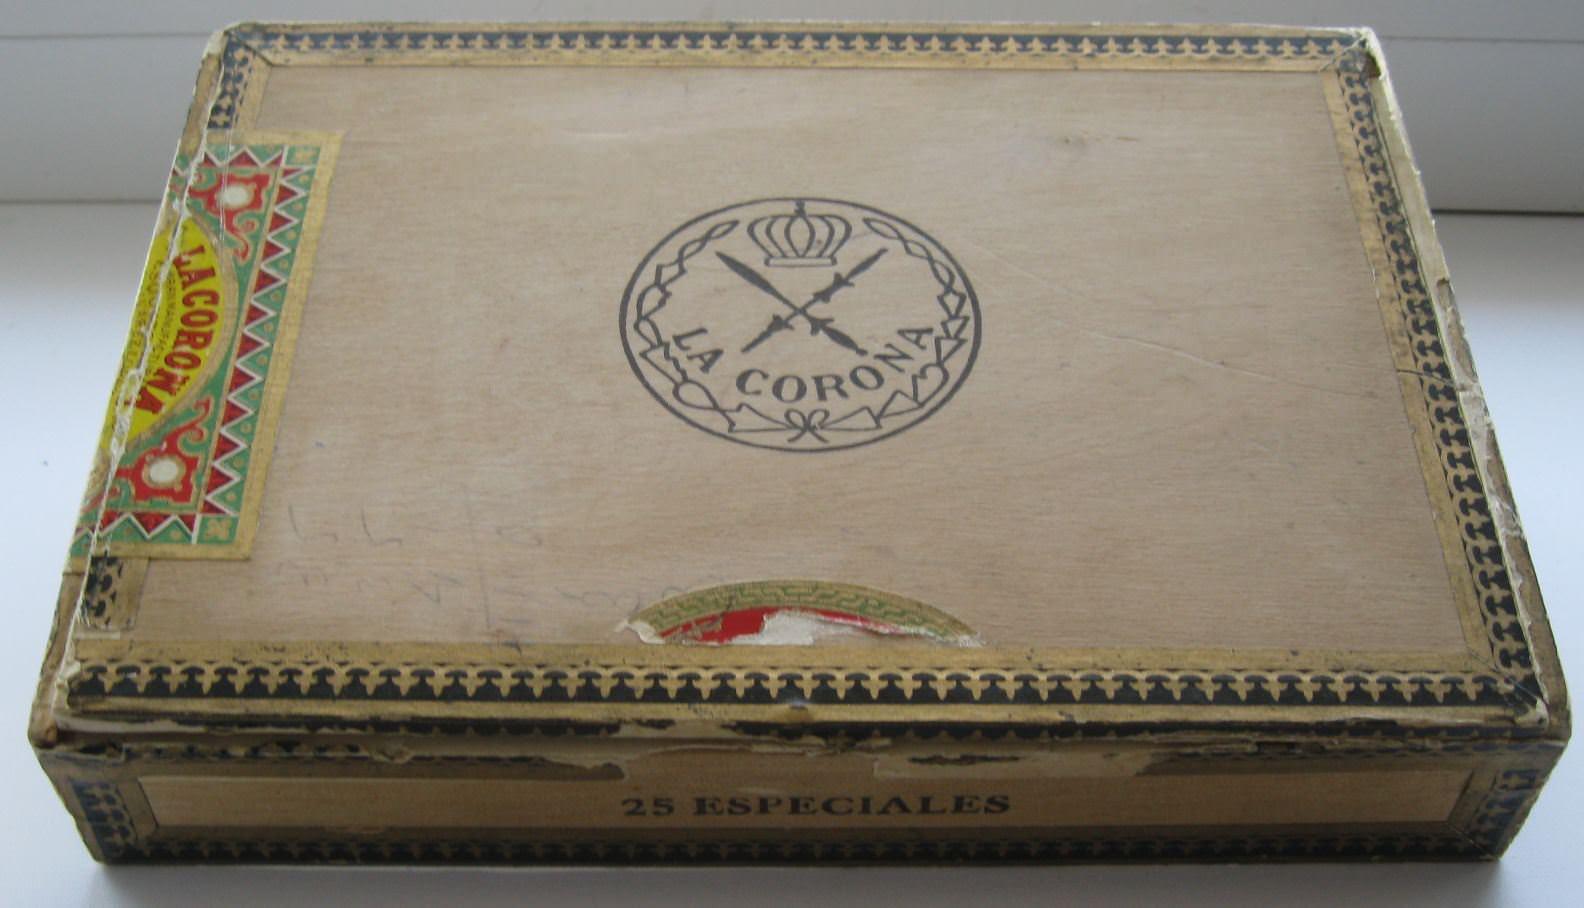 1966. Коробка от гаванских сигар.